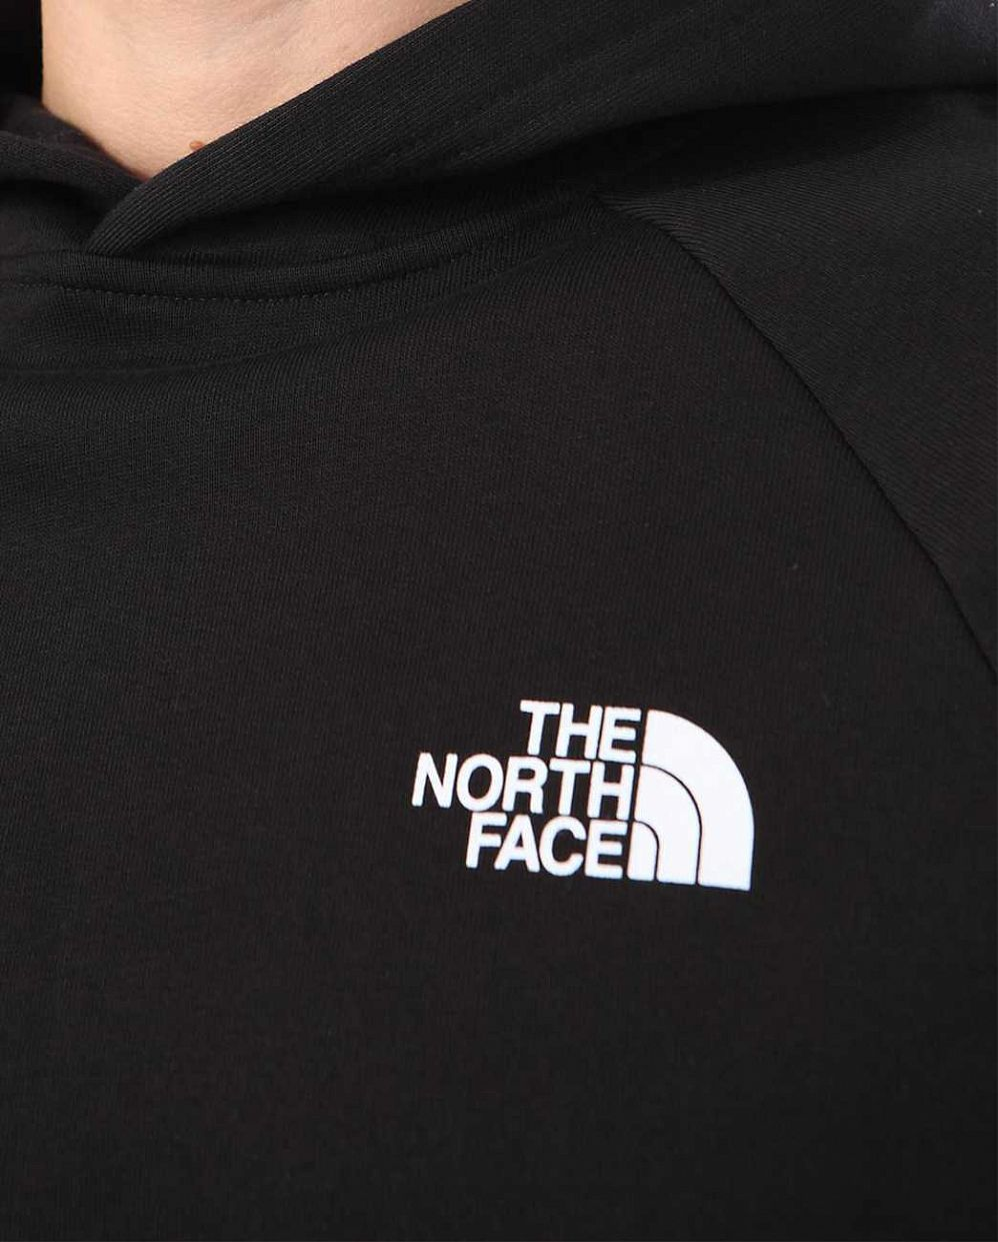 b2e251a40cb Толстовка мужская с капюшоном флисовая The North Face Raglan Red Box Black  отзывы  2  2 ...